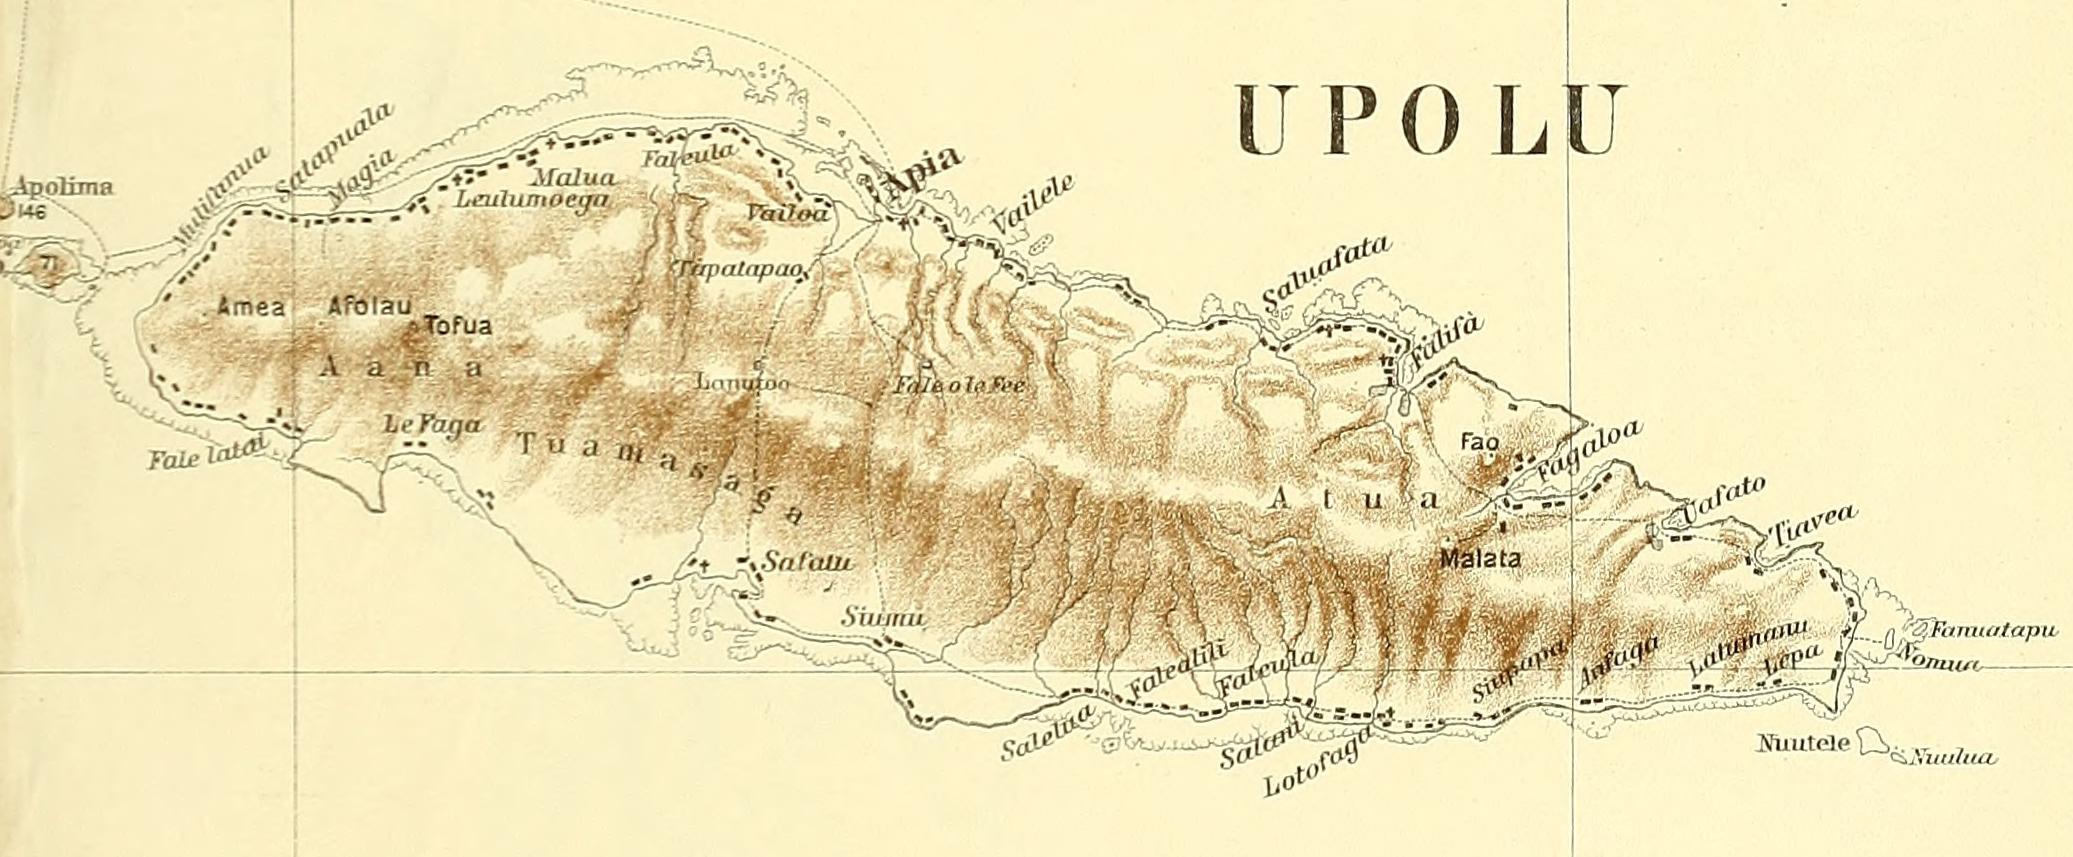 filepeip1910 map of upolu island samoajpg